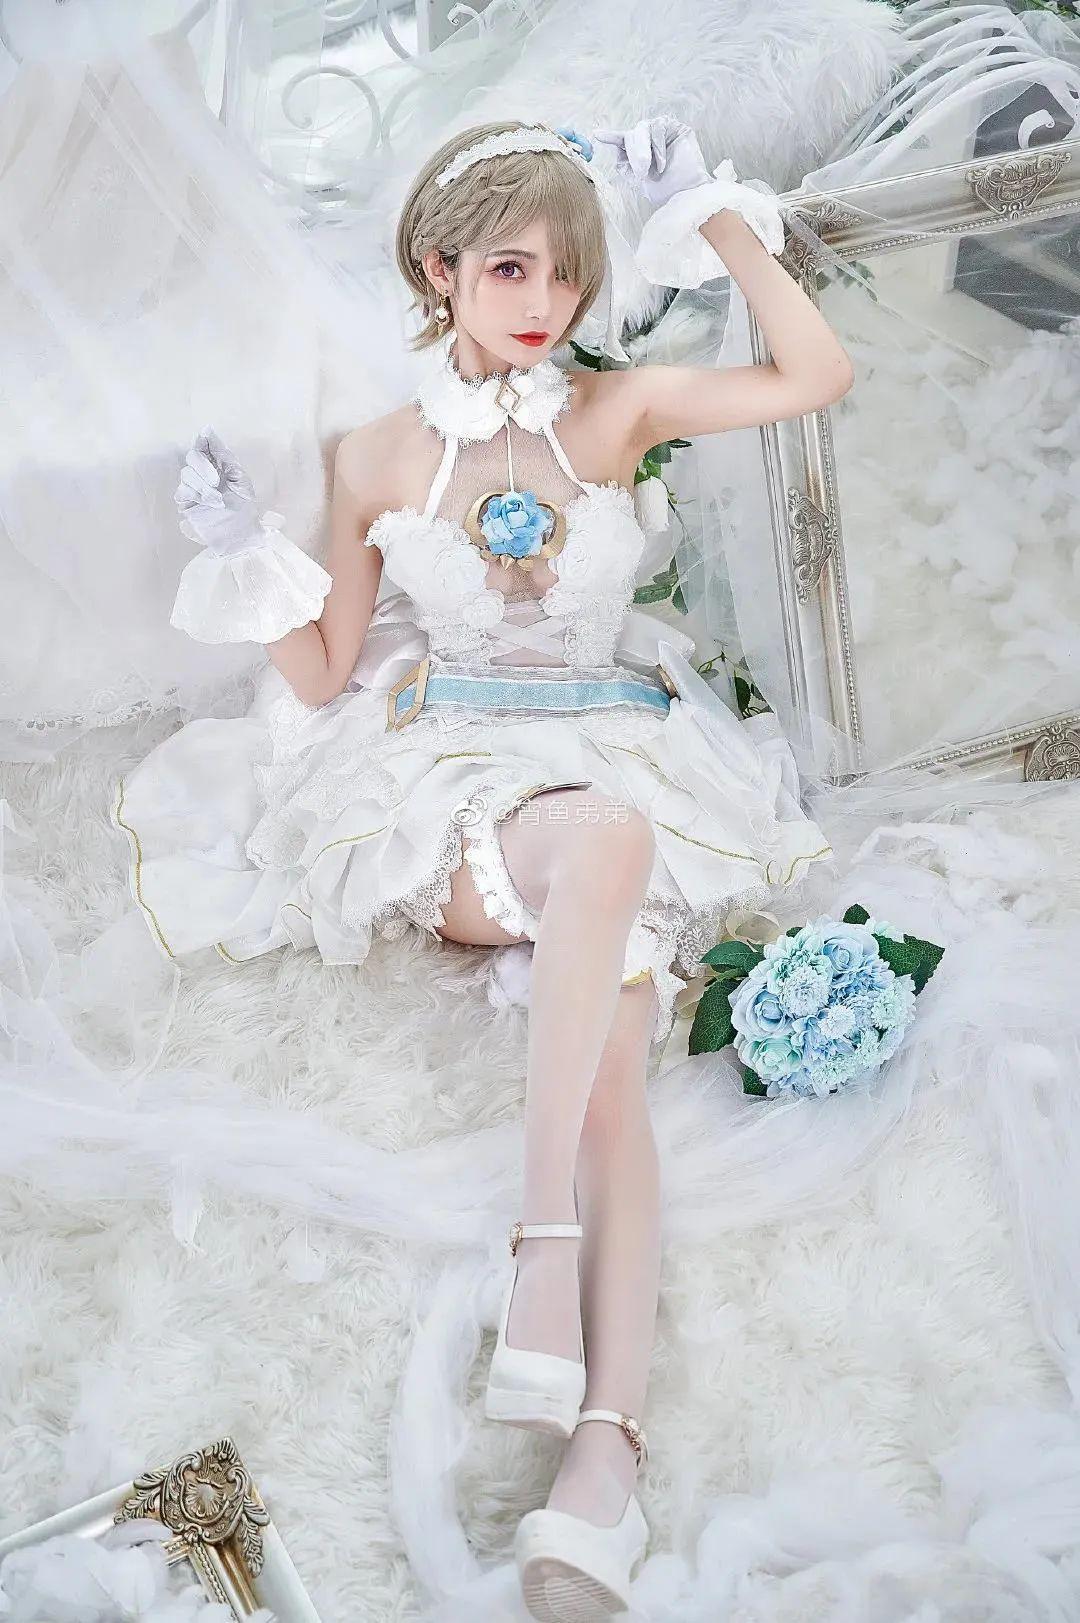 Cosplay-《崩坏3》丽塔(@宵鱼弟弟),这花嫁也太美了吧_图片 No.5